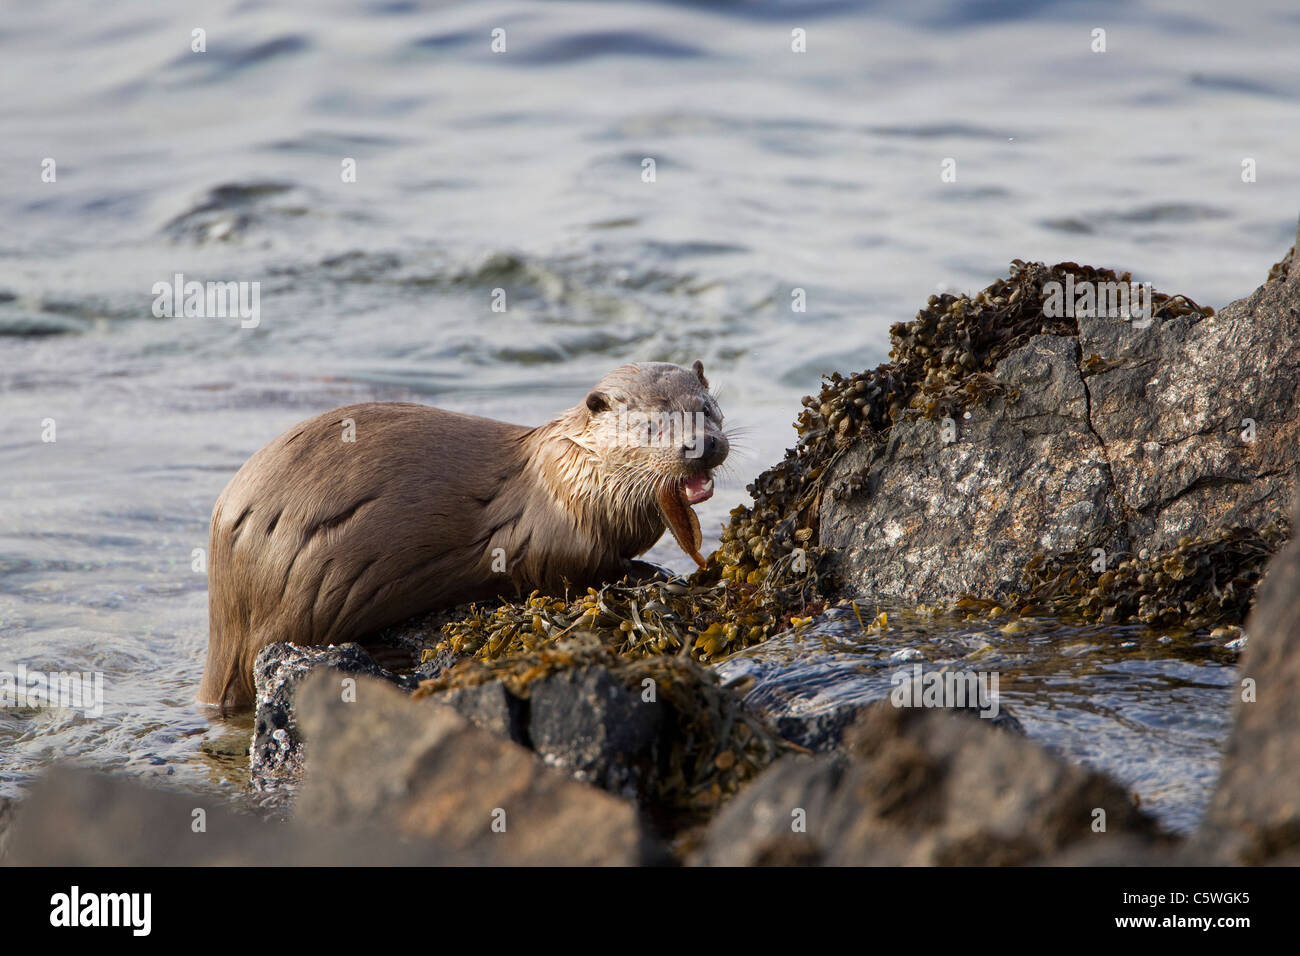 European River Otter (Lutra lutra) feeding on a Rockling on rocky coast. Shetland, Scotland, Great Britain. - Stock Image